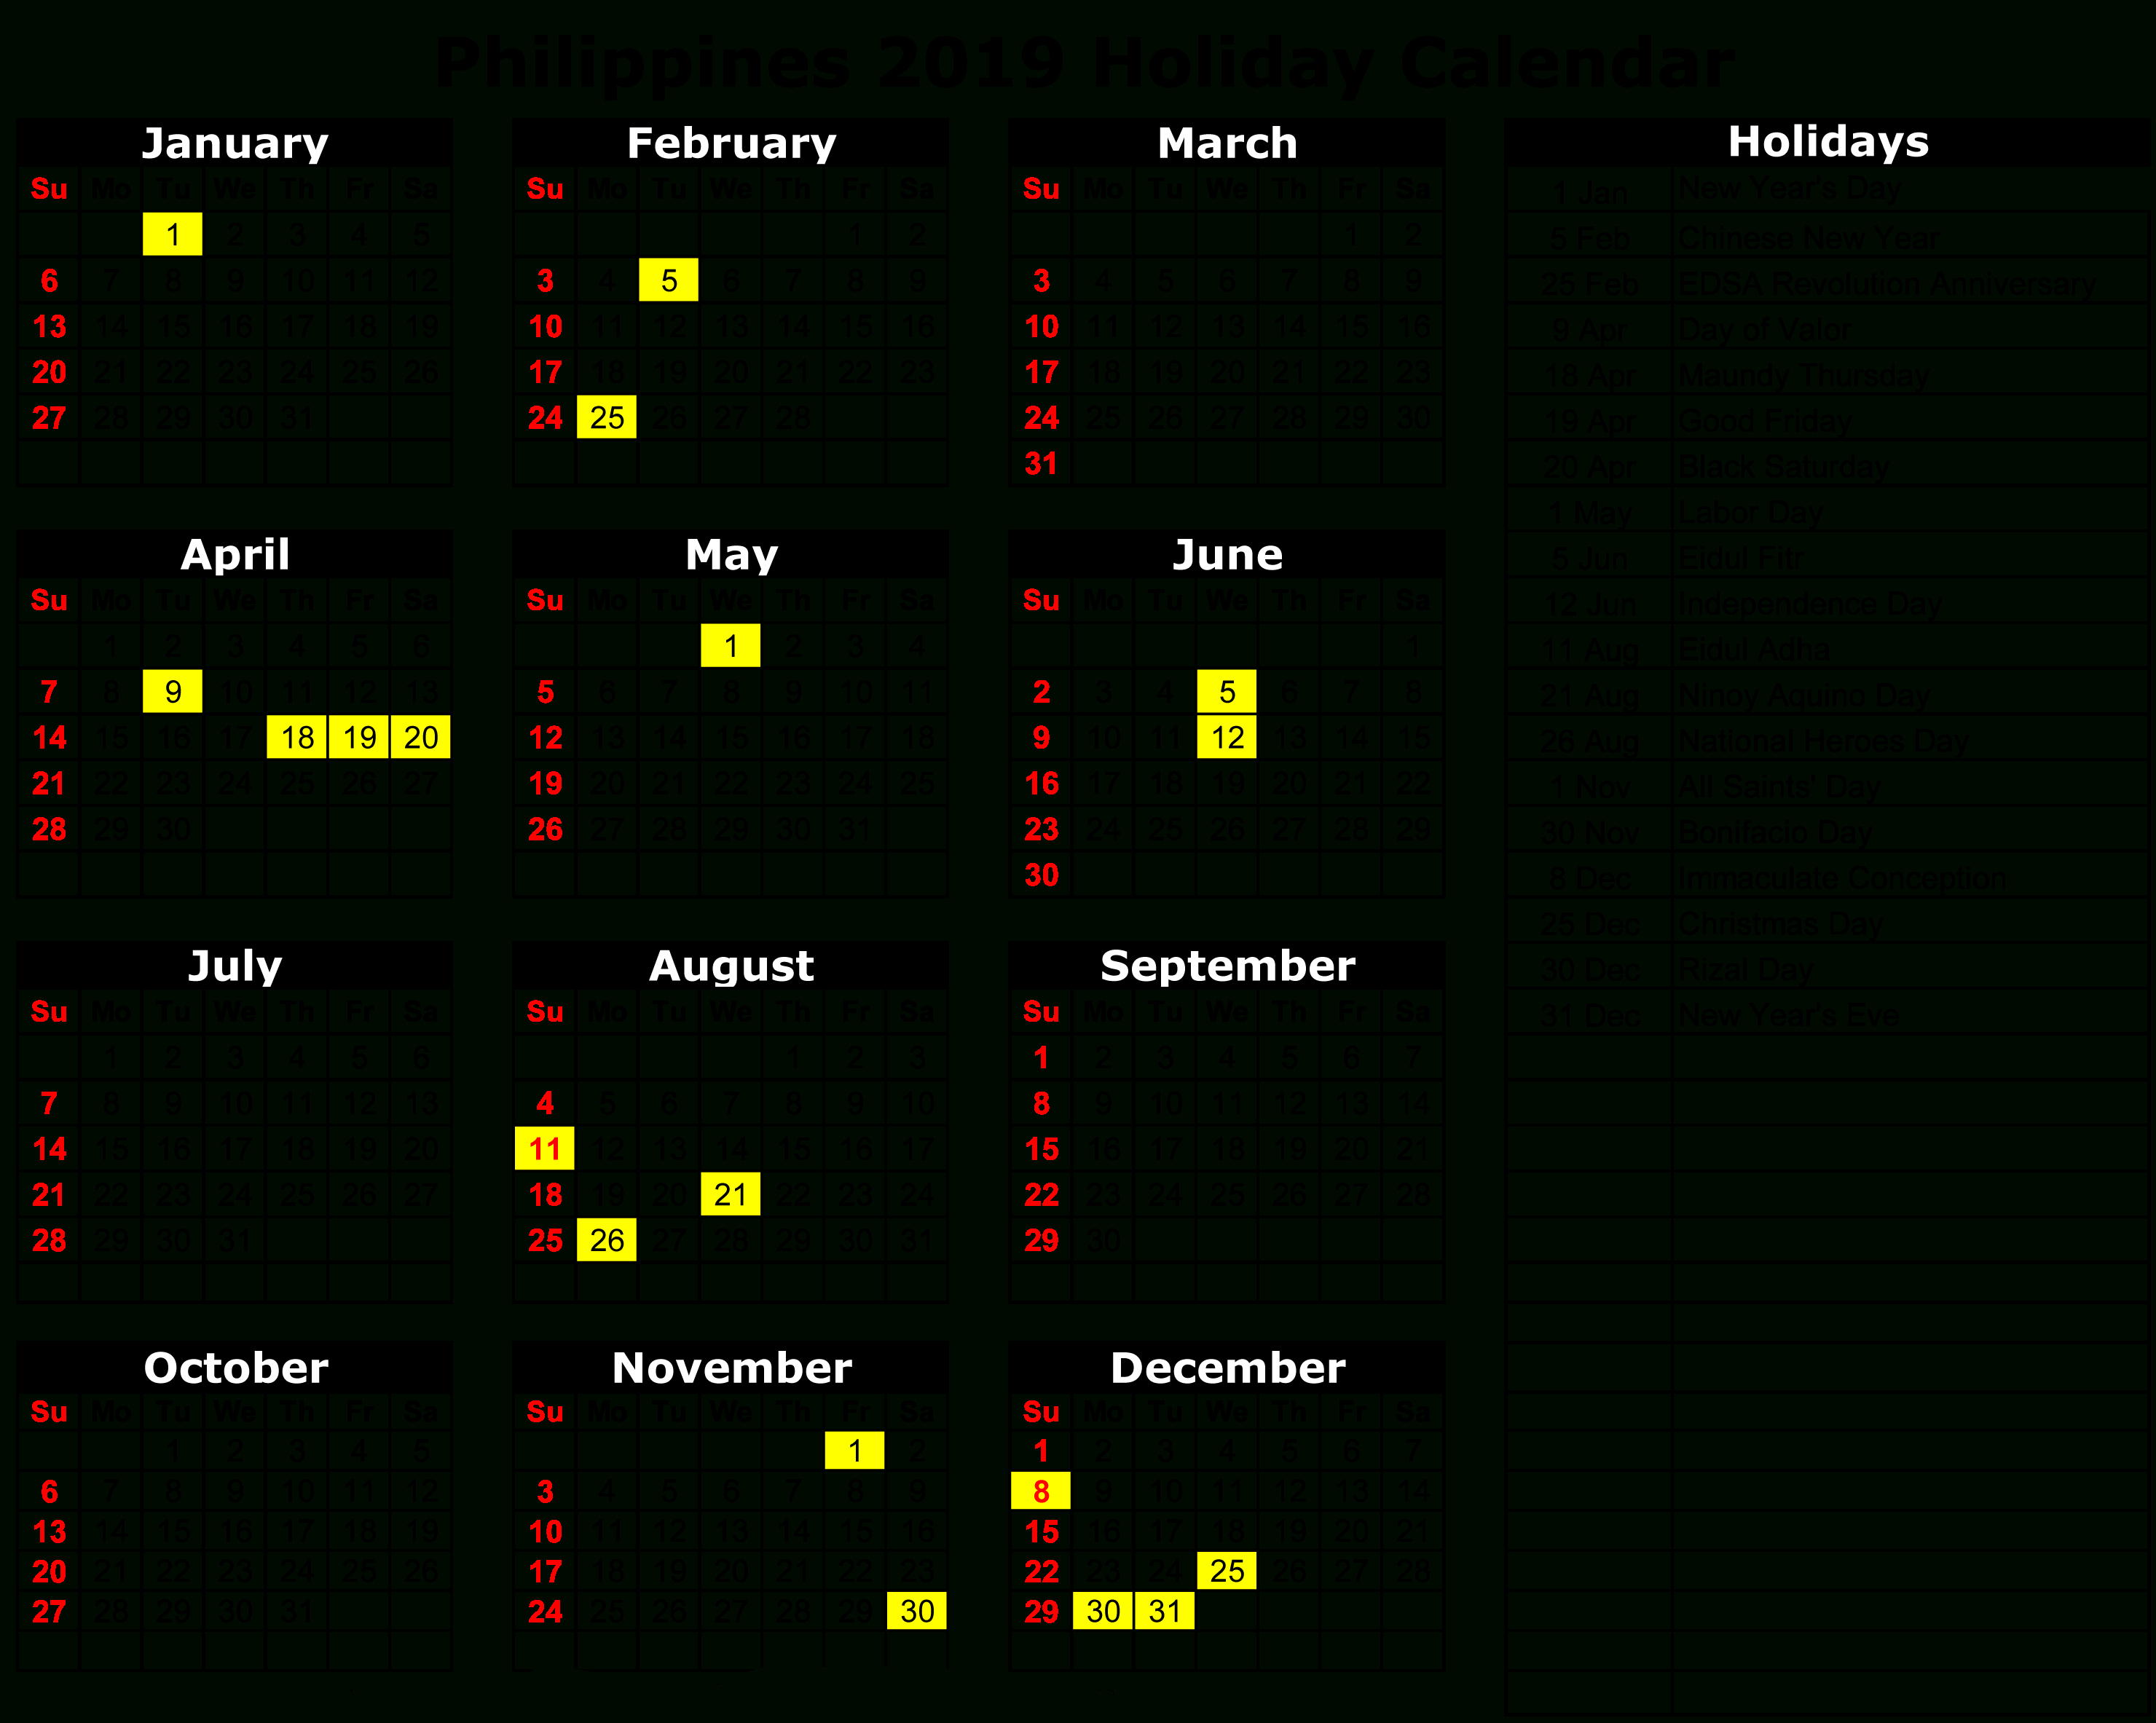 Philippines 2019 Holiday Calendar | Calendar 2019 | Holiday Calendar Calendar 2019 Events And Holidays